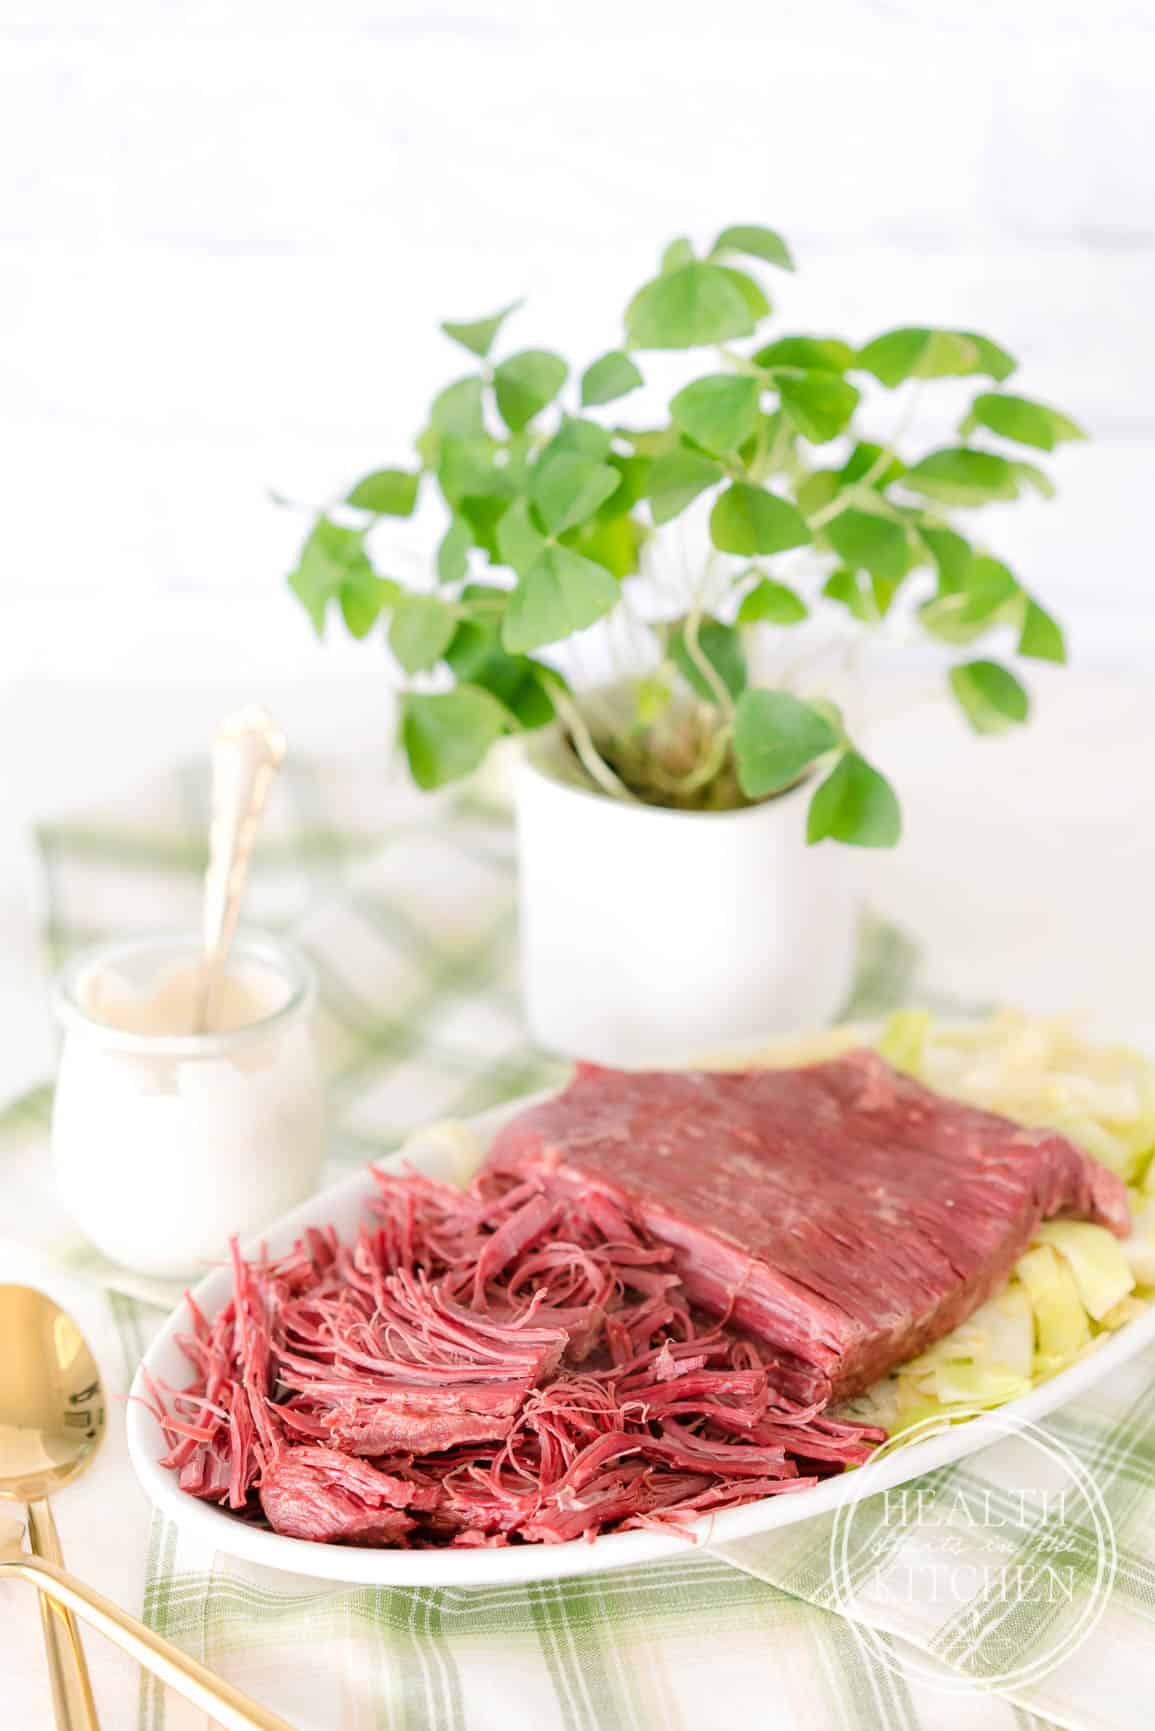 Corn Beef Keto  Low Carb Keto Pressure Cooker Corned Beef Brisket Health